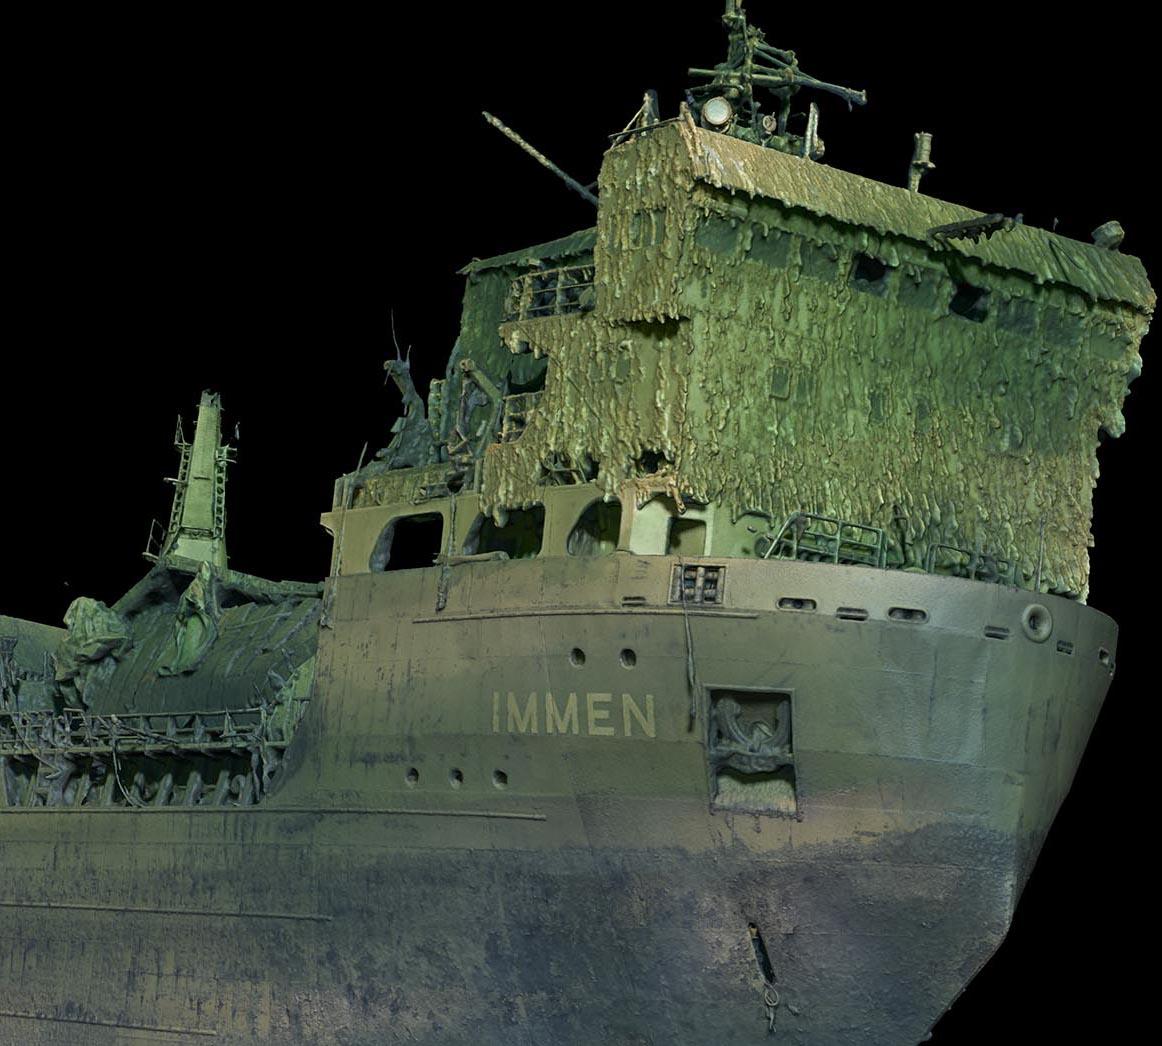 3D scanning shipwreck